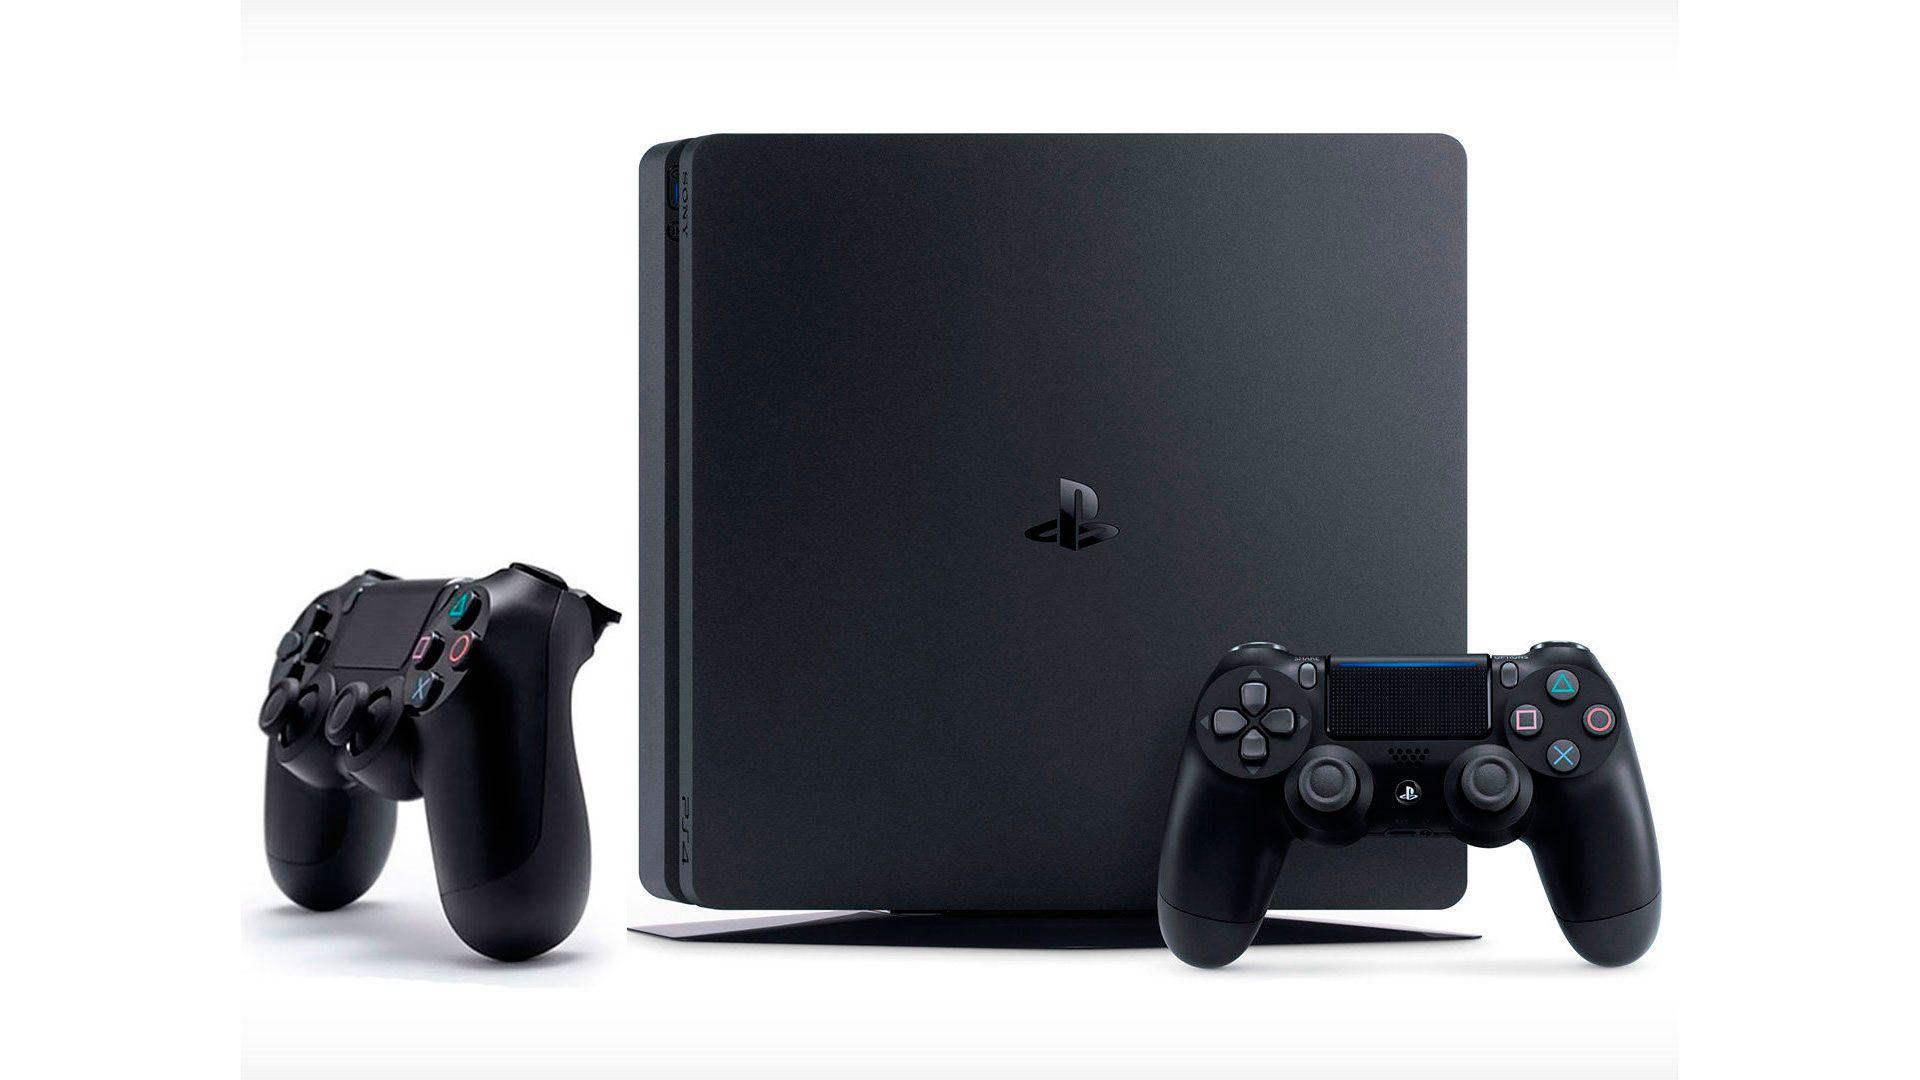 PlayStation 4 Slim 500Gb FIFA 17 и 2 джойстика изображение 1